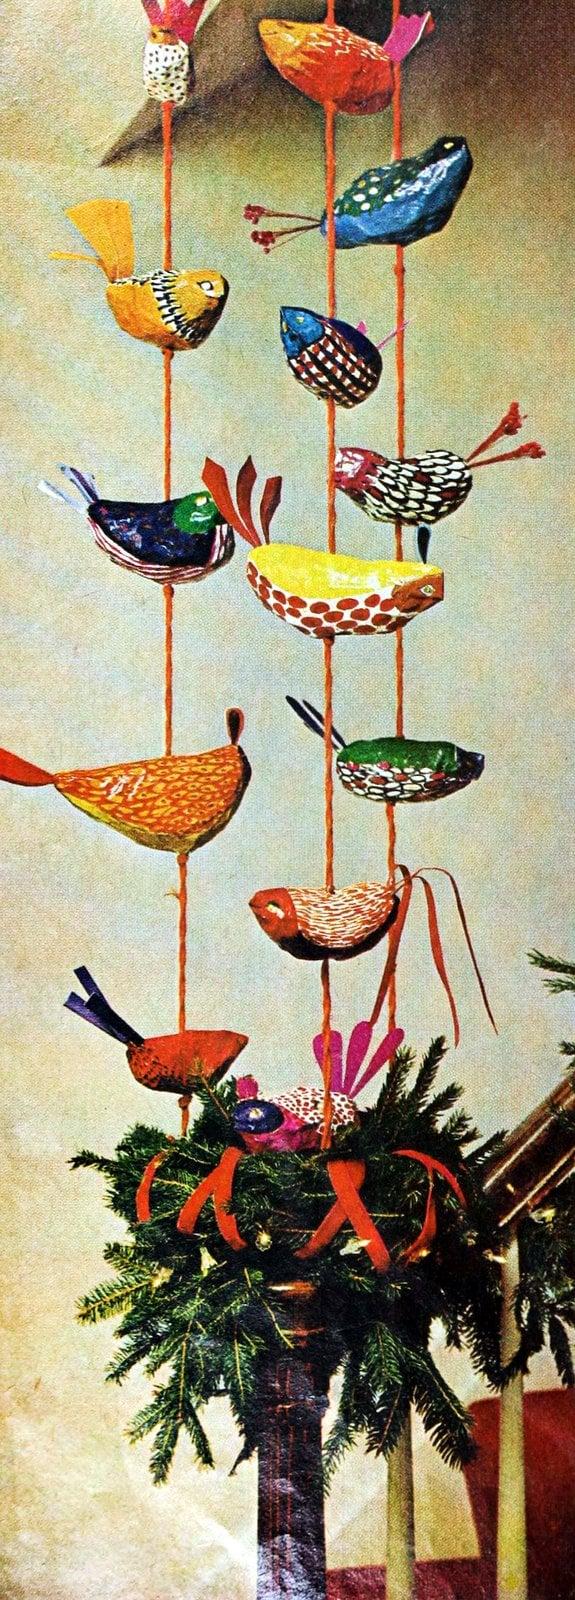 fanciful papier-mache birds